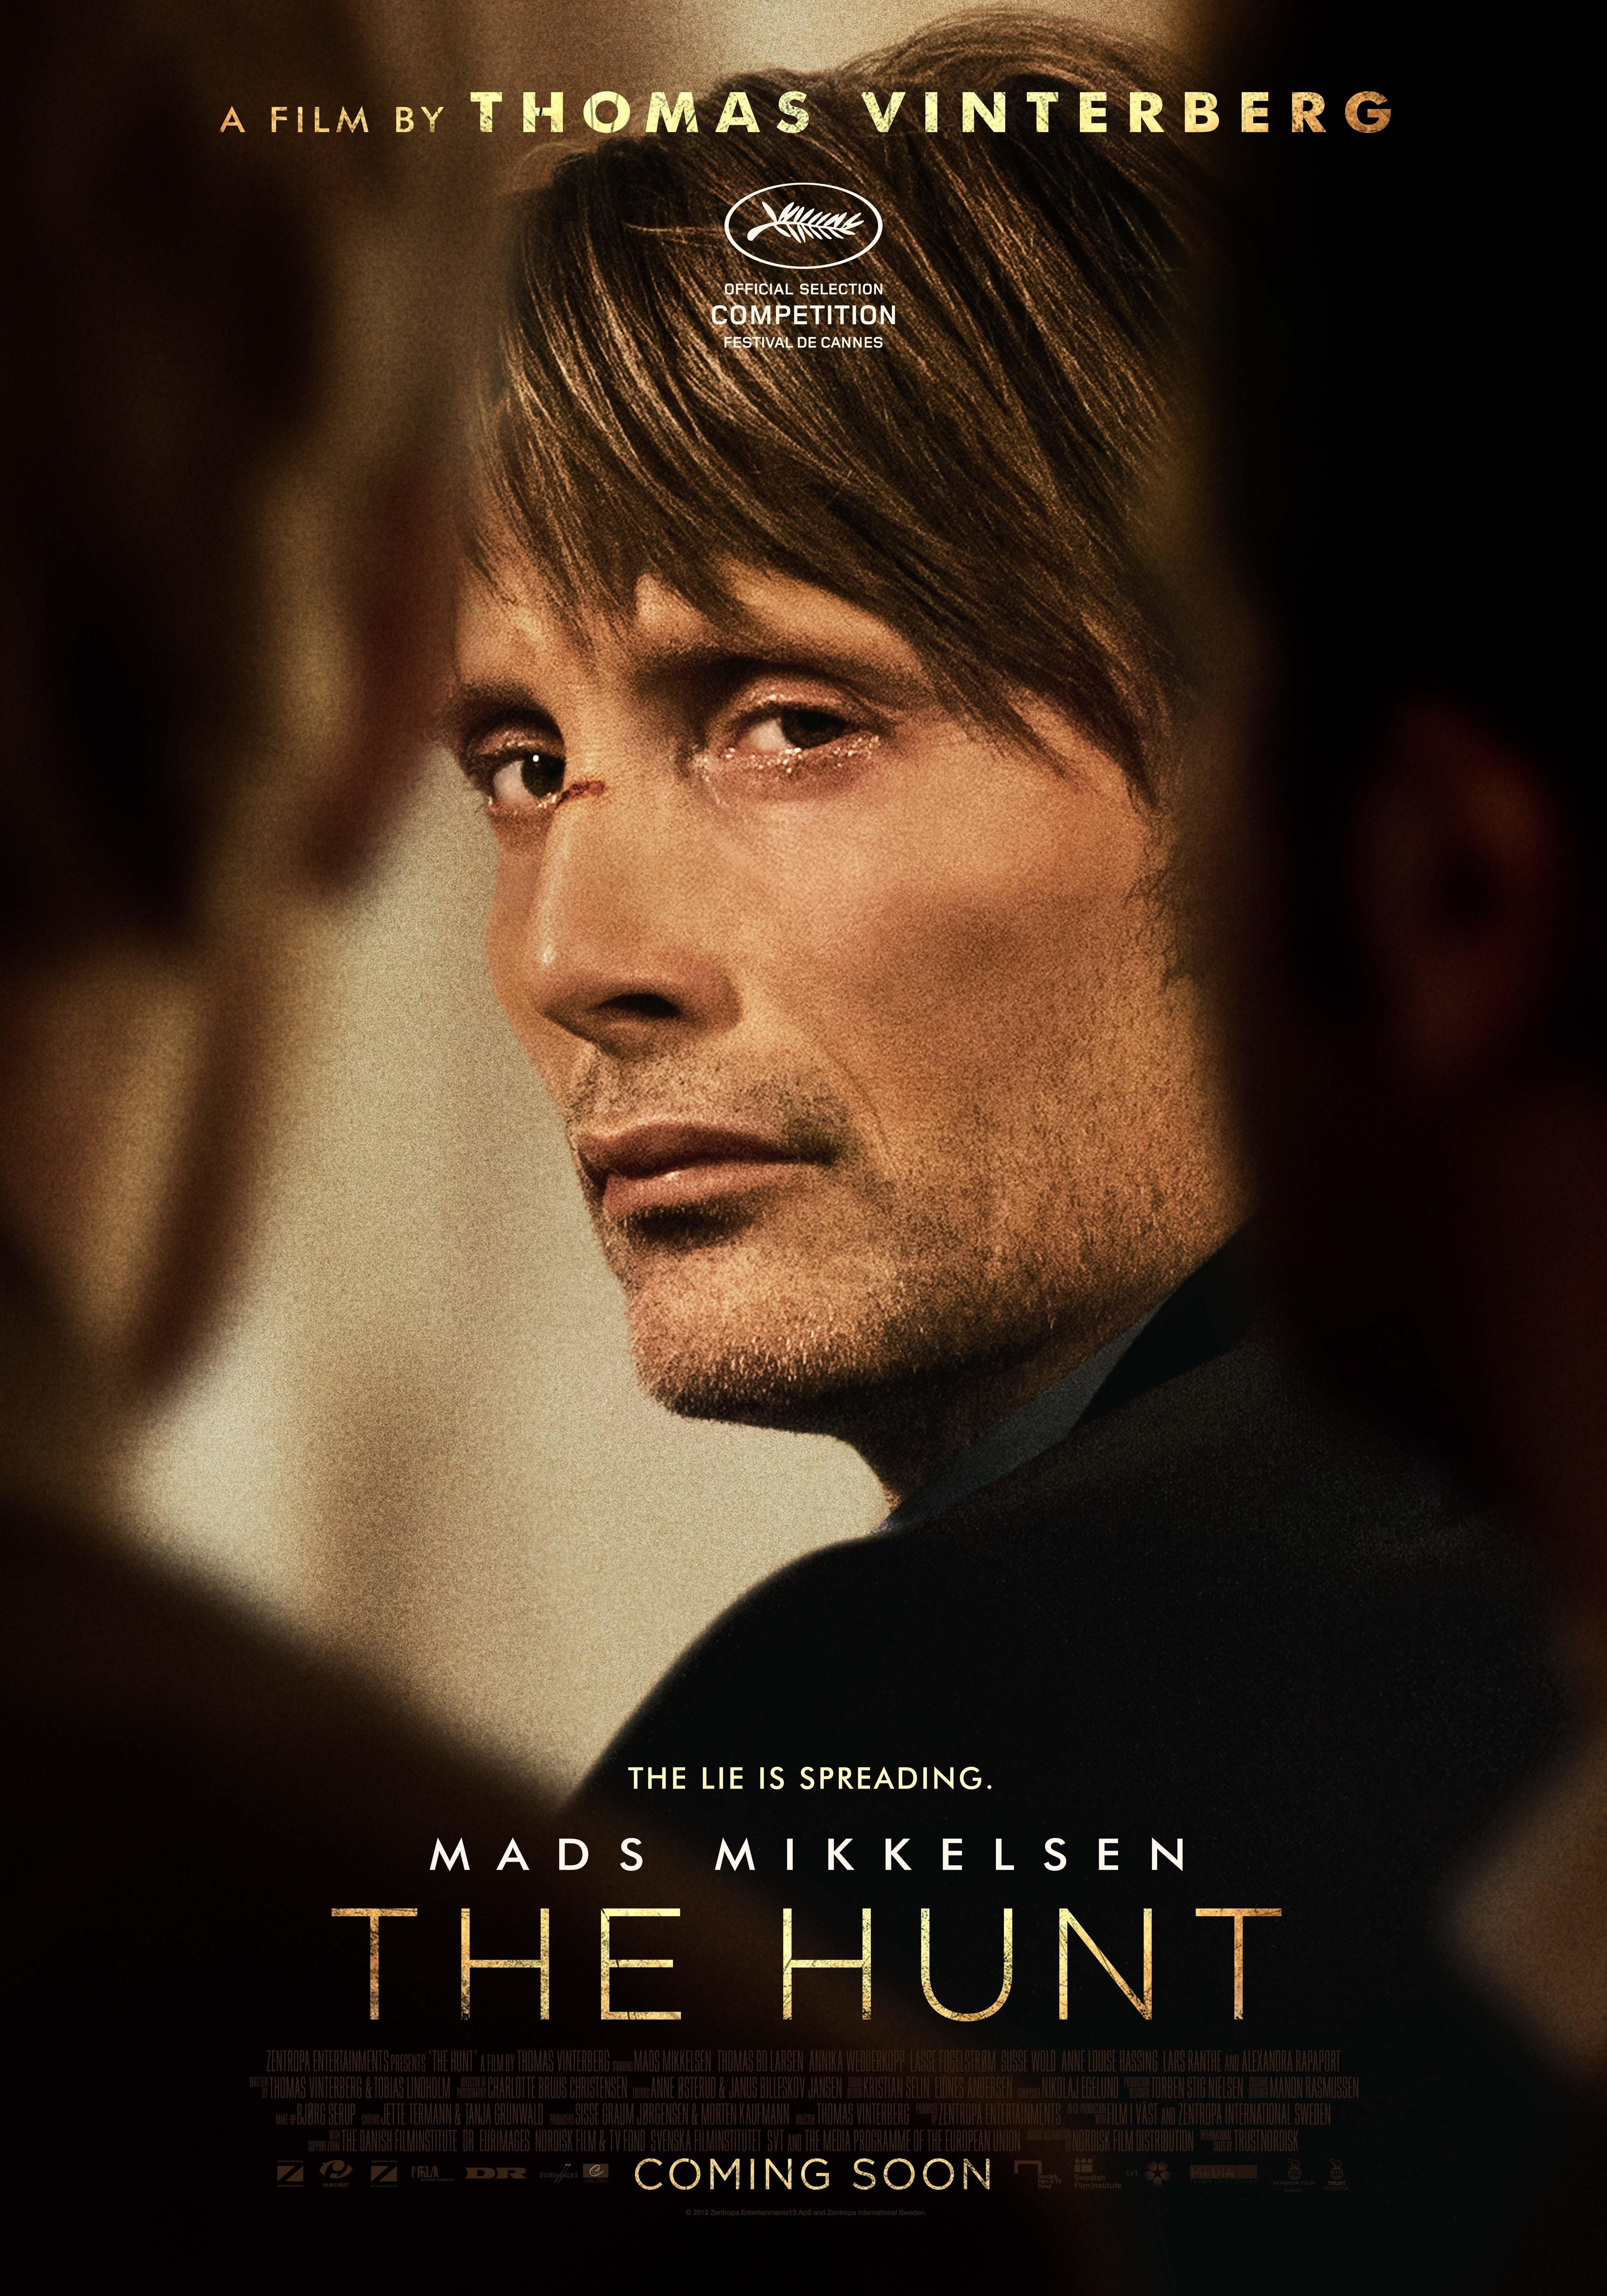 Film i dag 2006 12 31 3